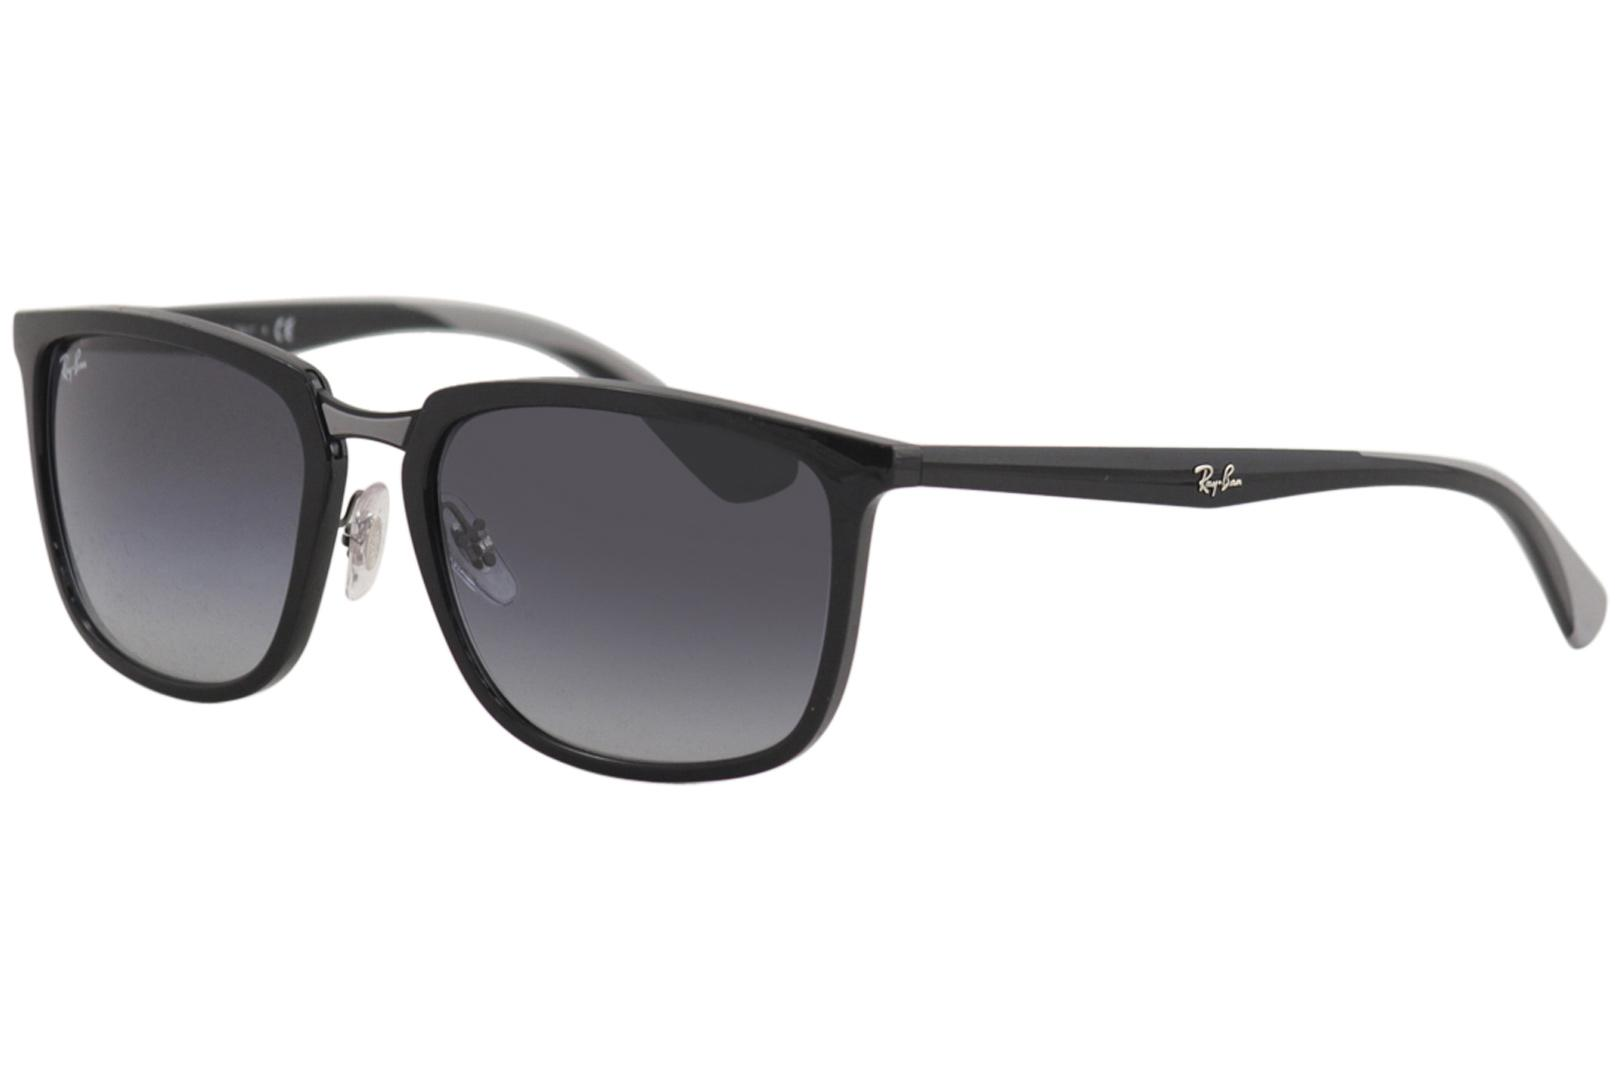 dbece7b022 Ray Ban Men's RB4303 RB/4303 RayBan Fashion Square Sunglasses